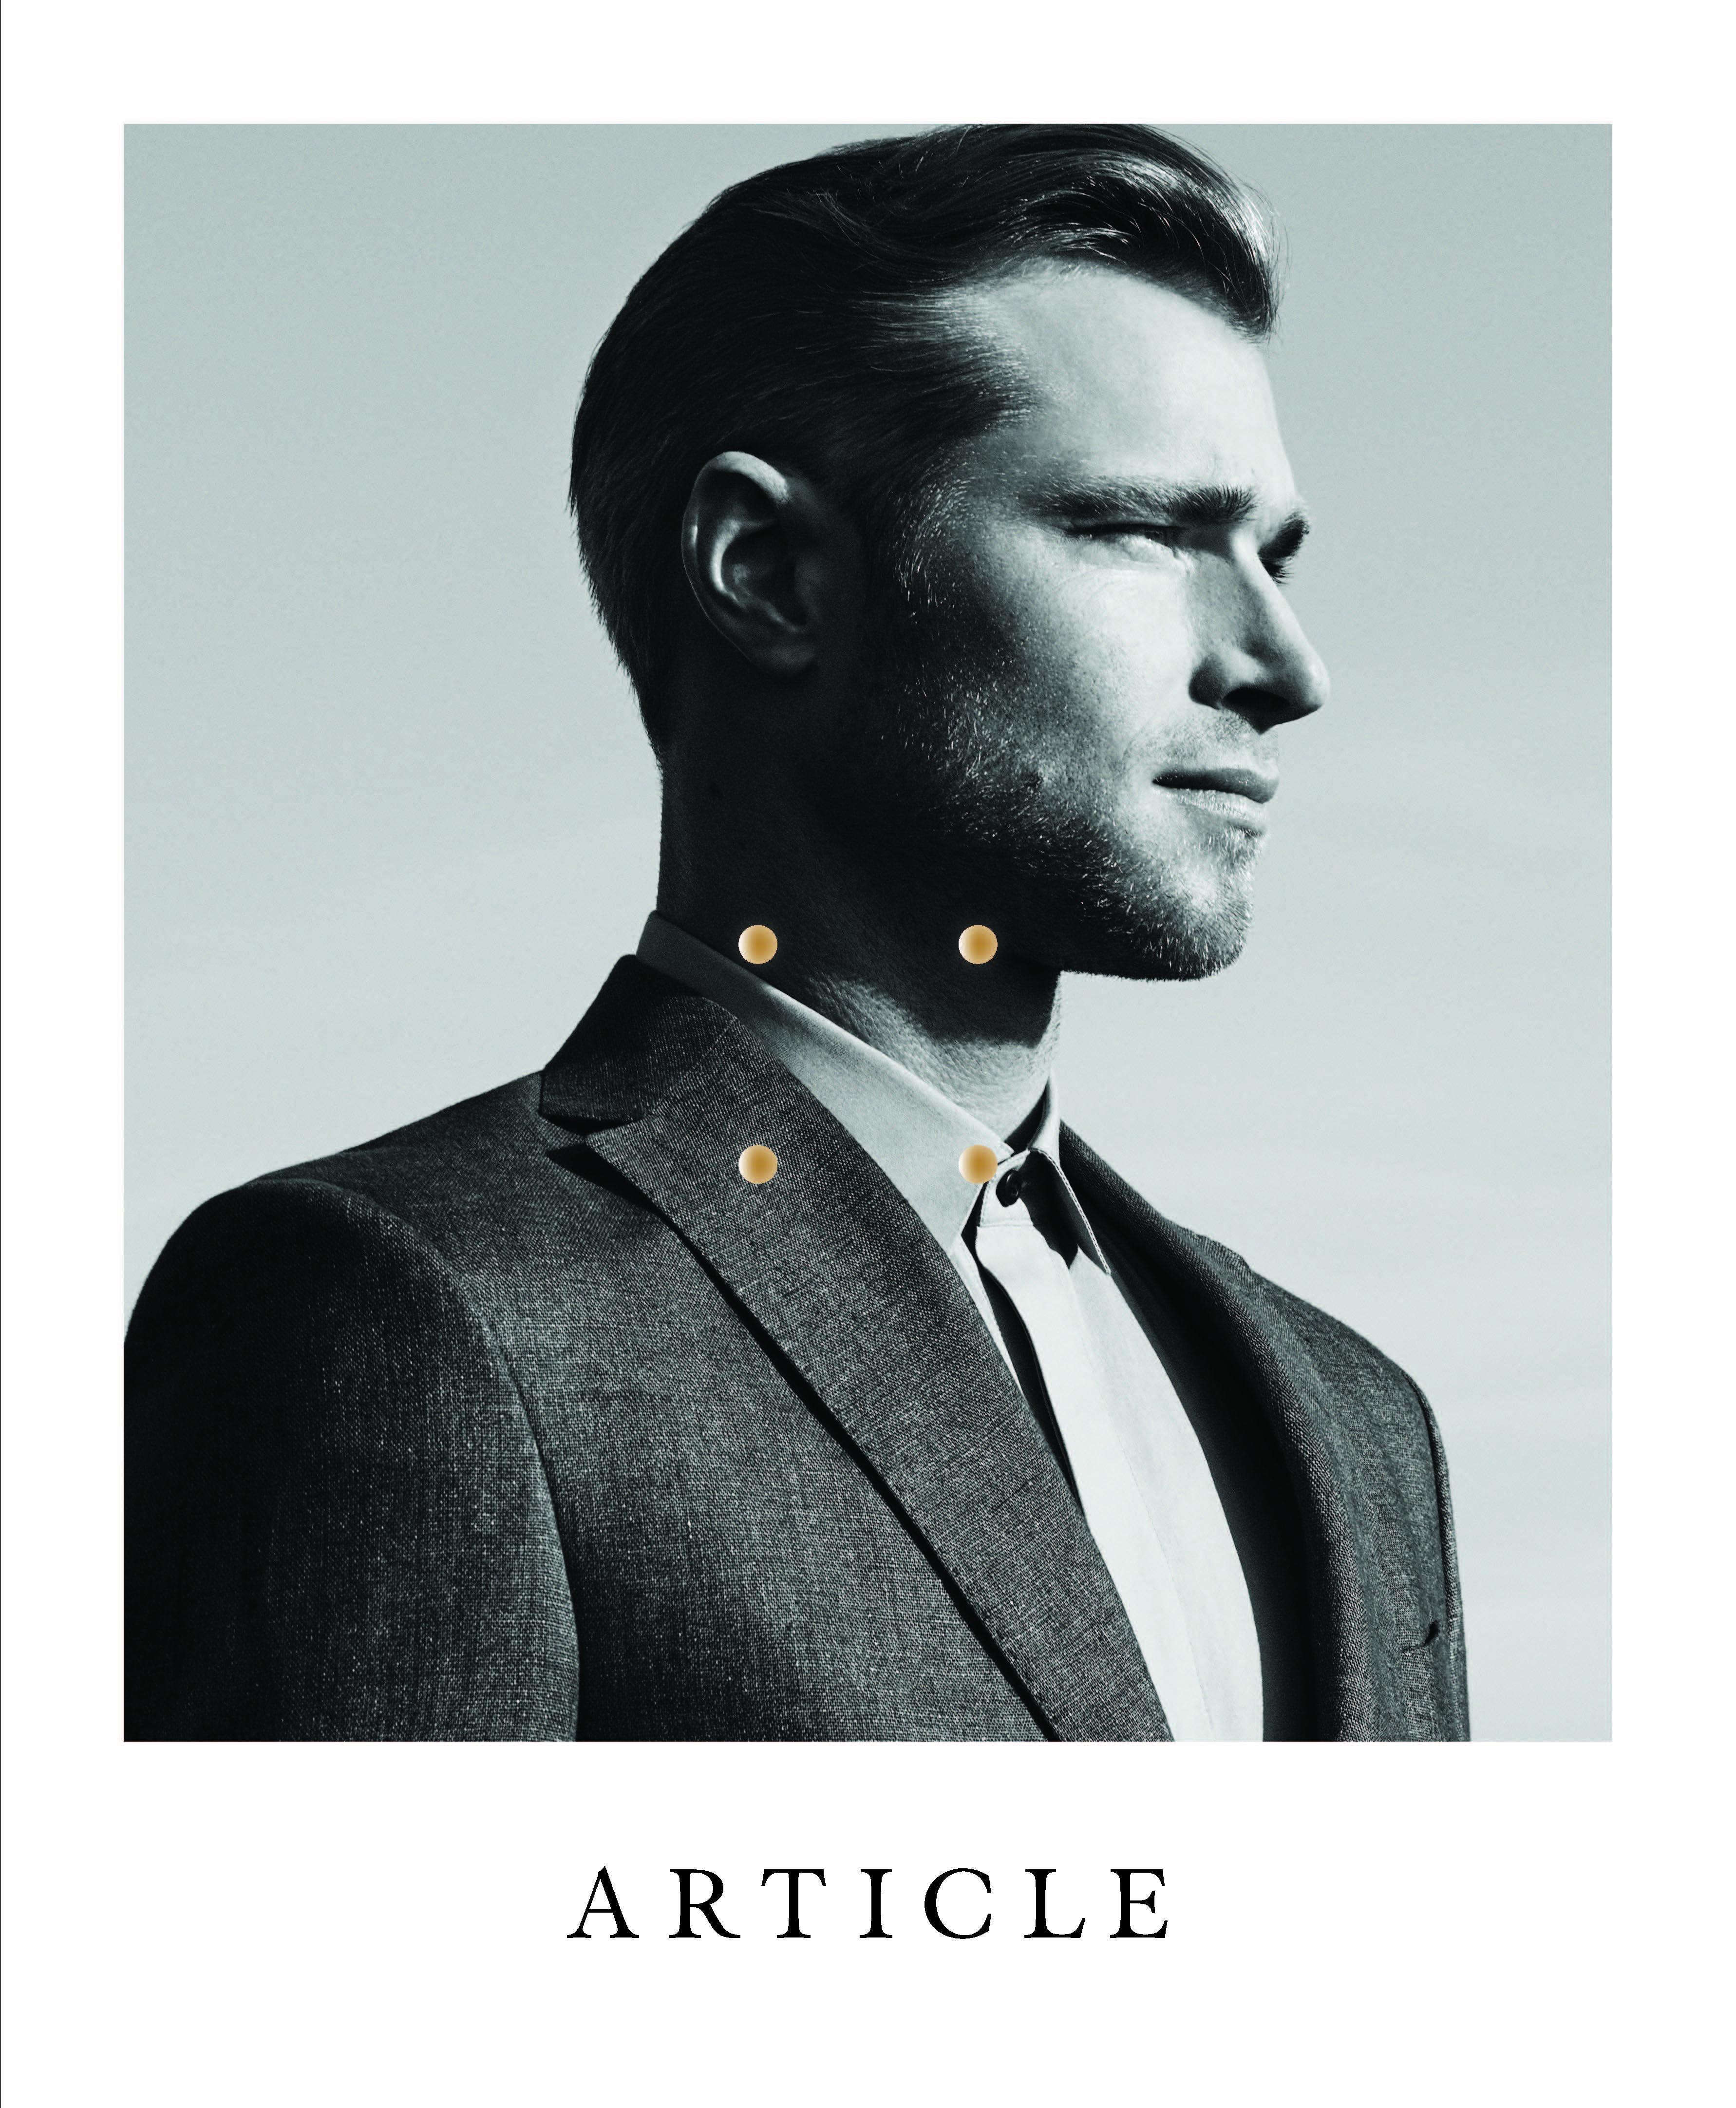 david frampton actor cover article magazine